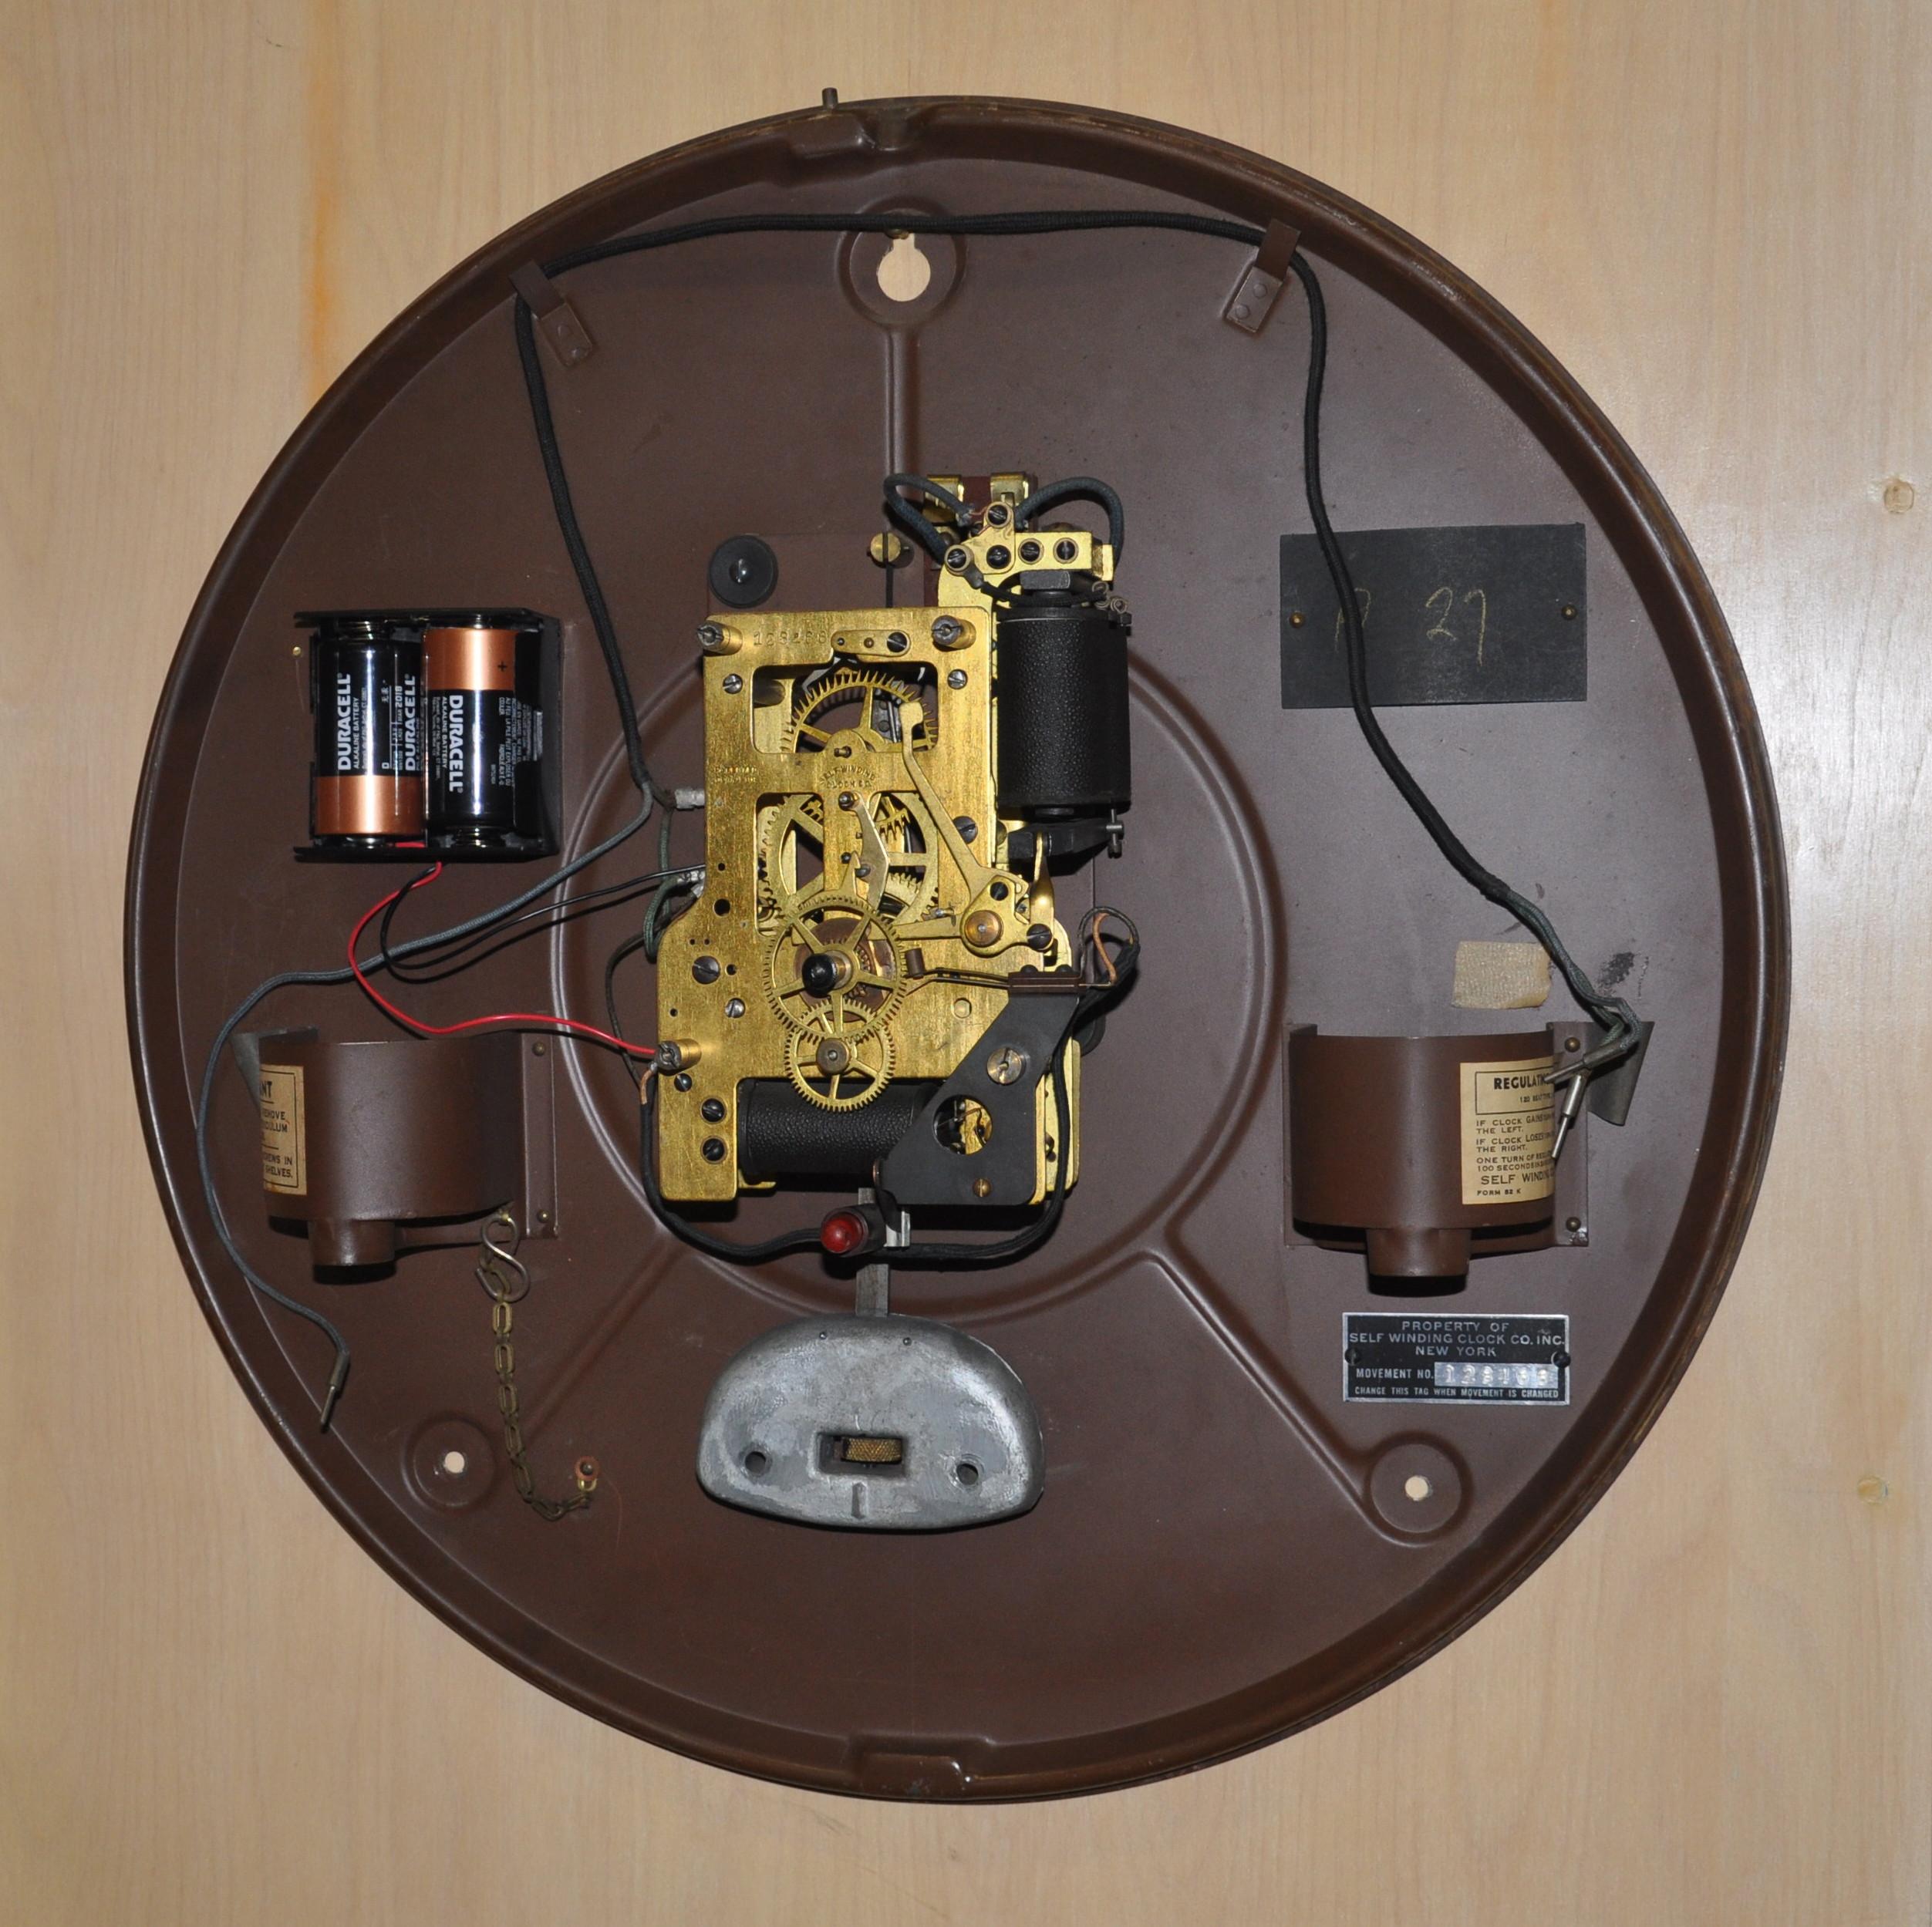 Self_Winding_Clock_Company_Western_Union_clock file self winding clock company western union clock jpg self winding clock wiring diagram at gsmx.co